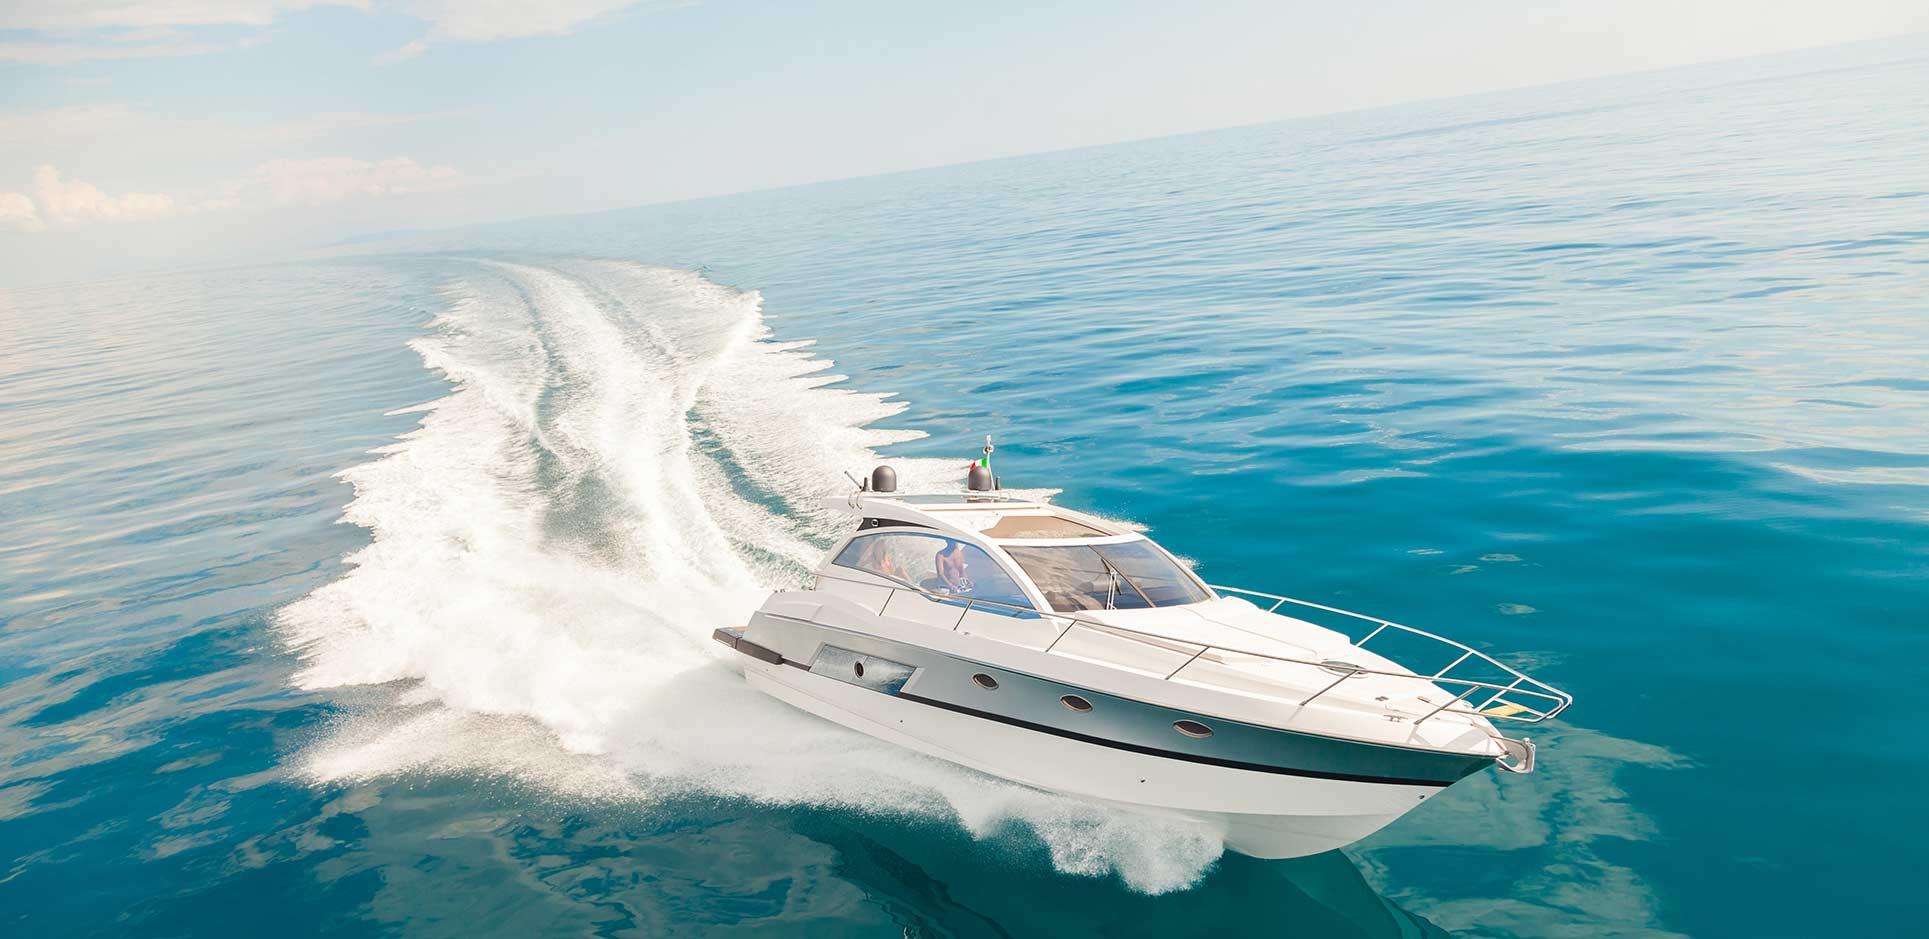 Luxury yacht on the open water